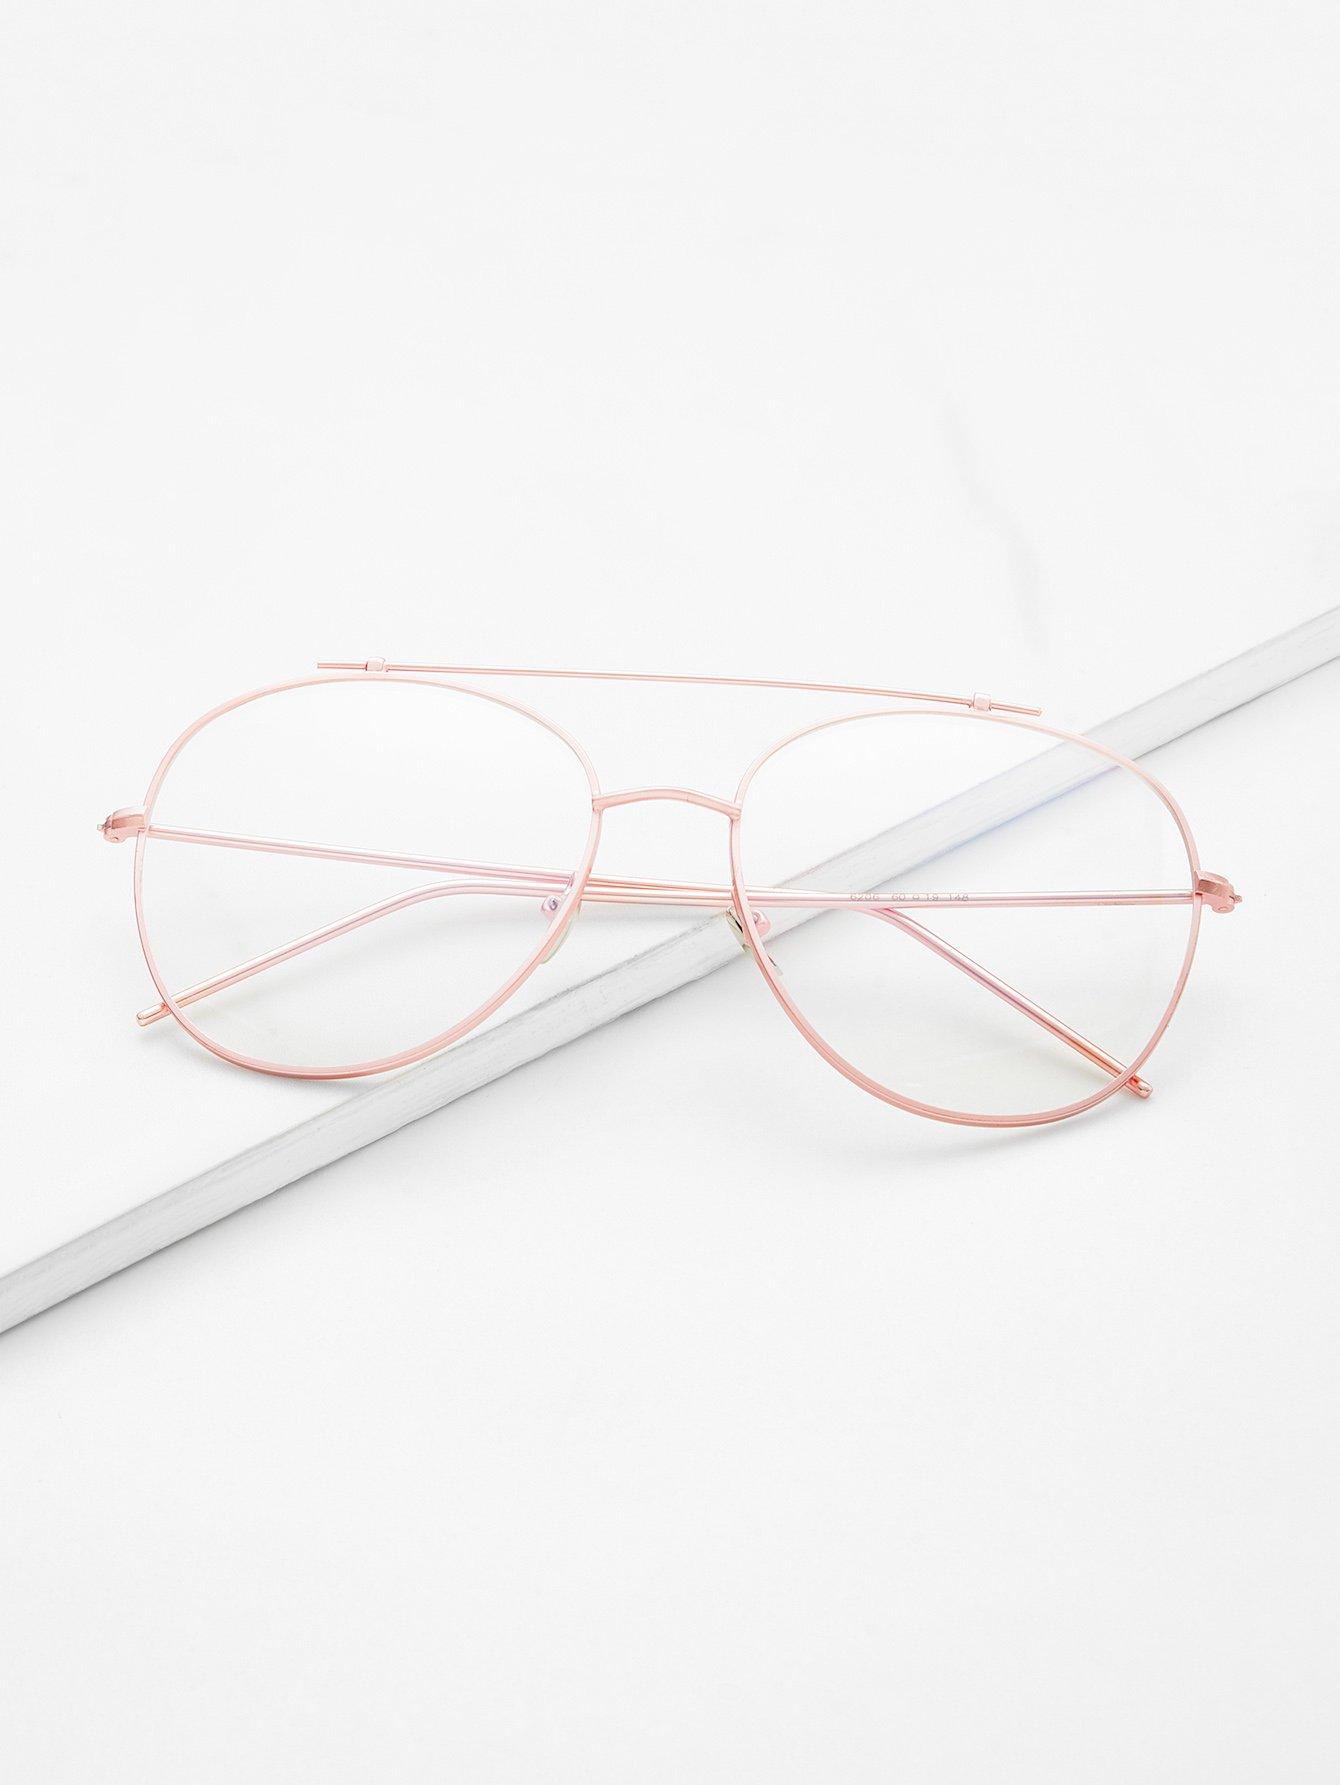 Rose Gold Frame Clear Lens Double Bridge Glasses black open frame gold trim glasses